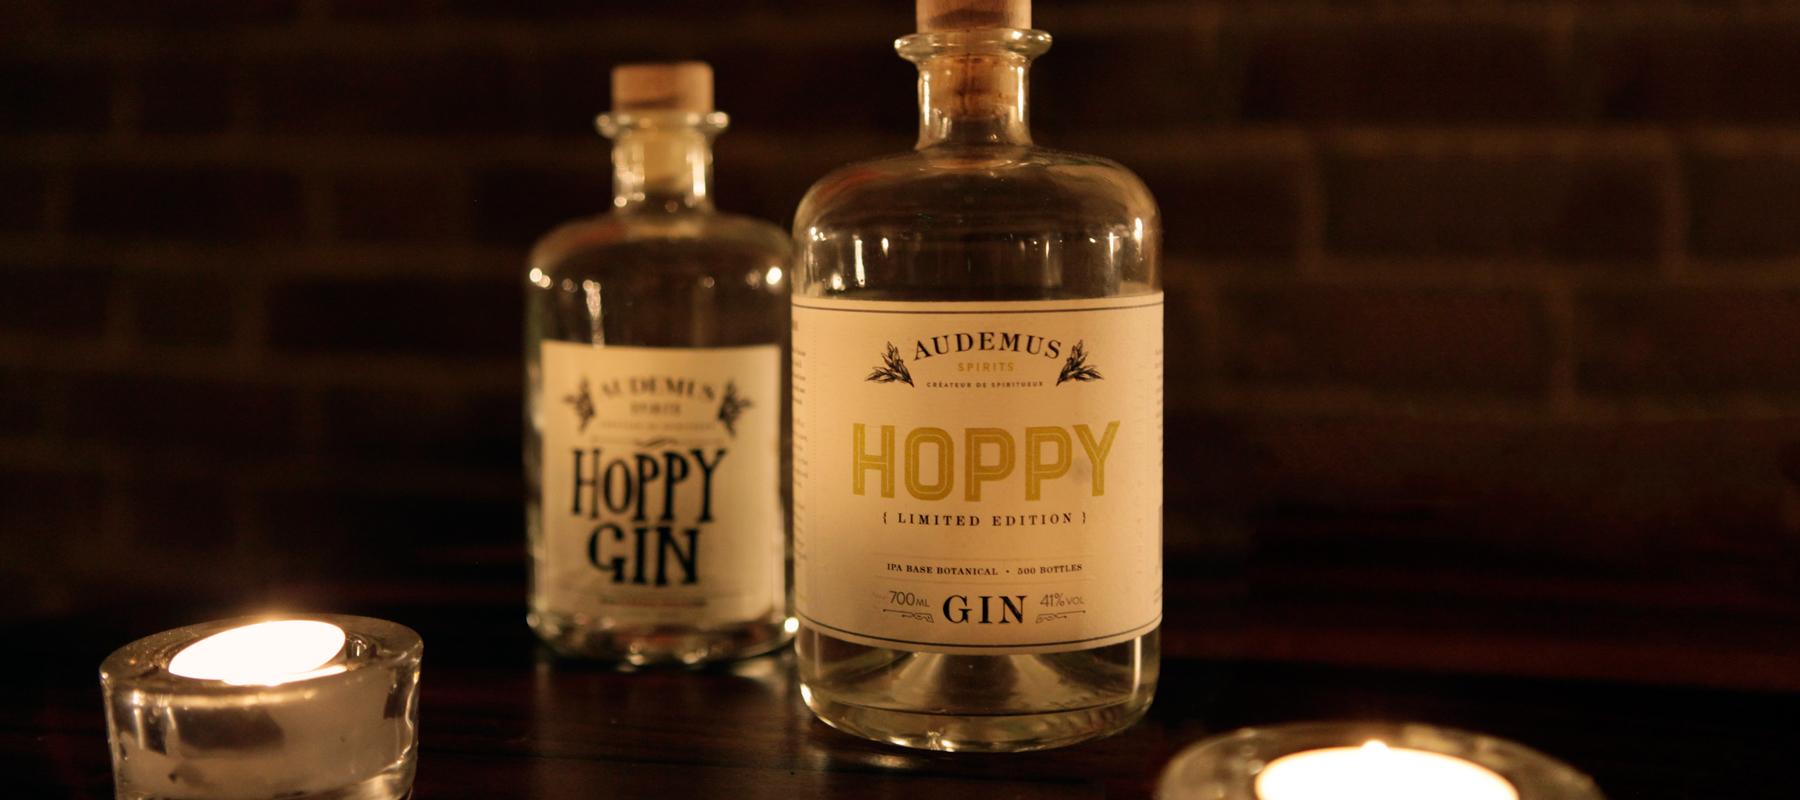 Hoppy Gin